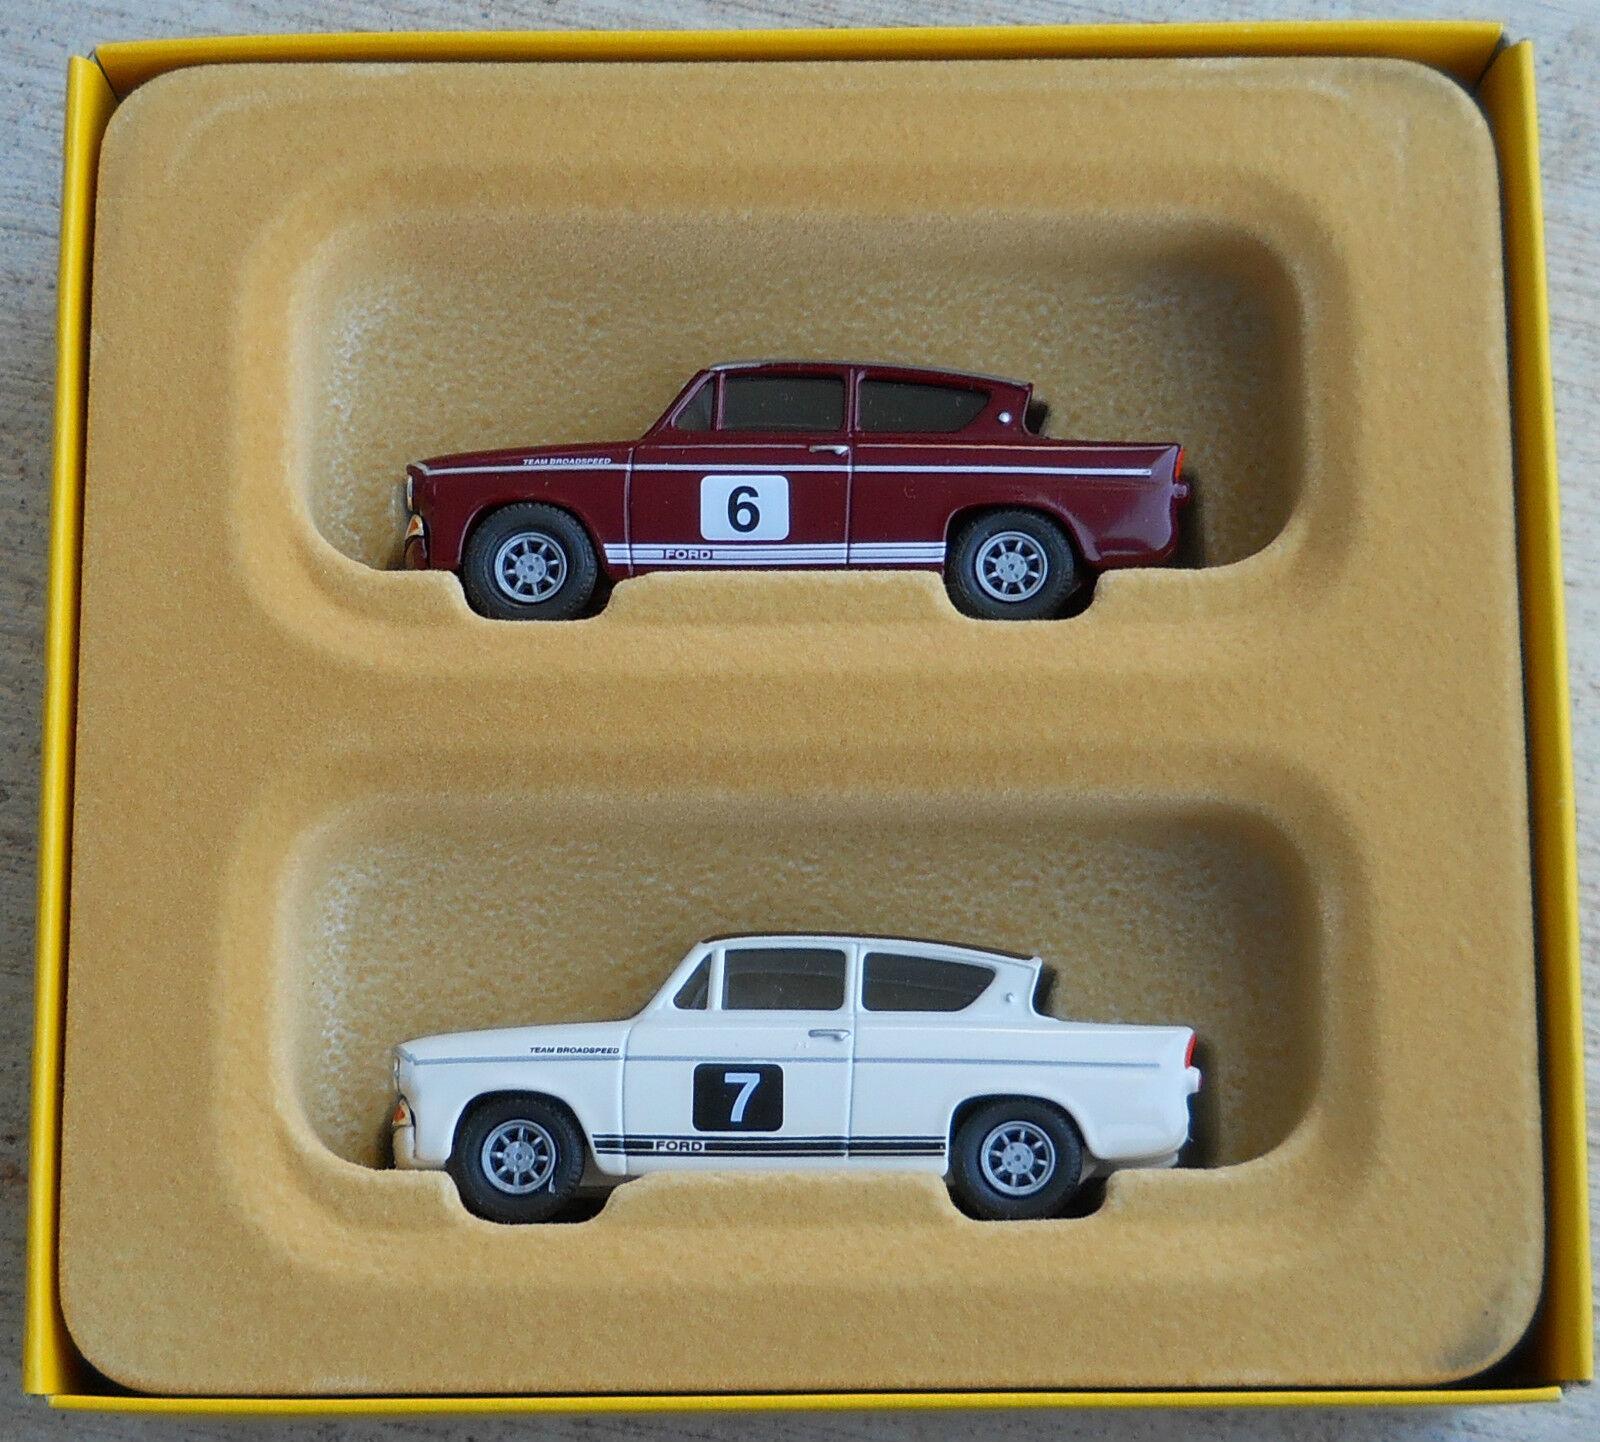 Vanguards Vanguards Vanguards broadspeed Racing Ford anglias ba1002 Menta en caja eeb0c7